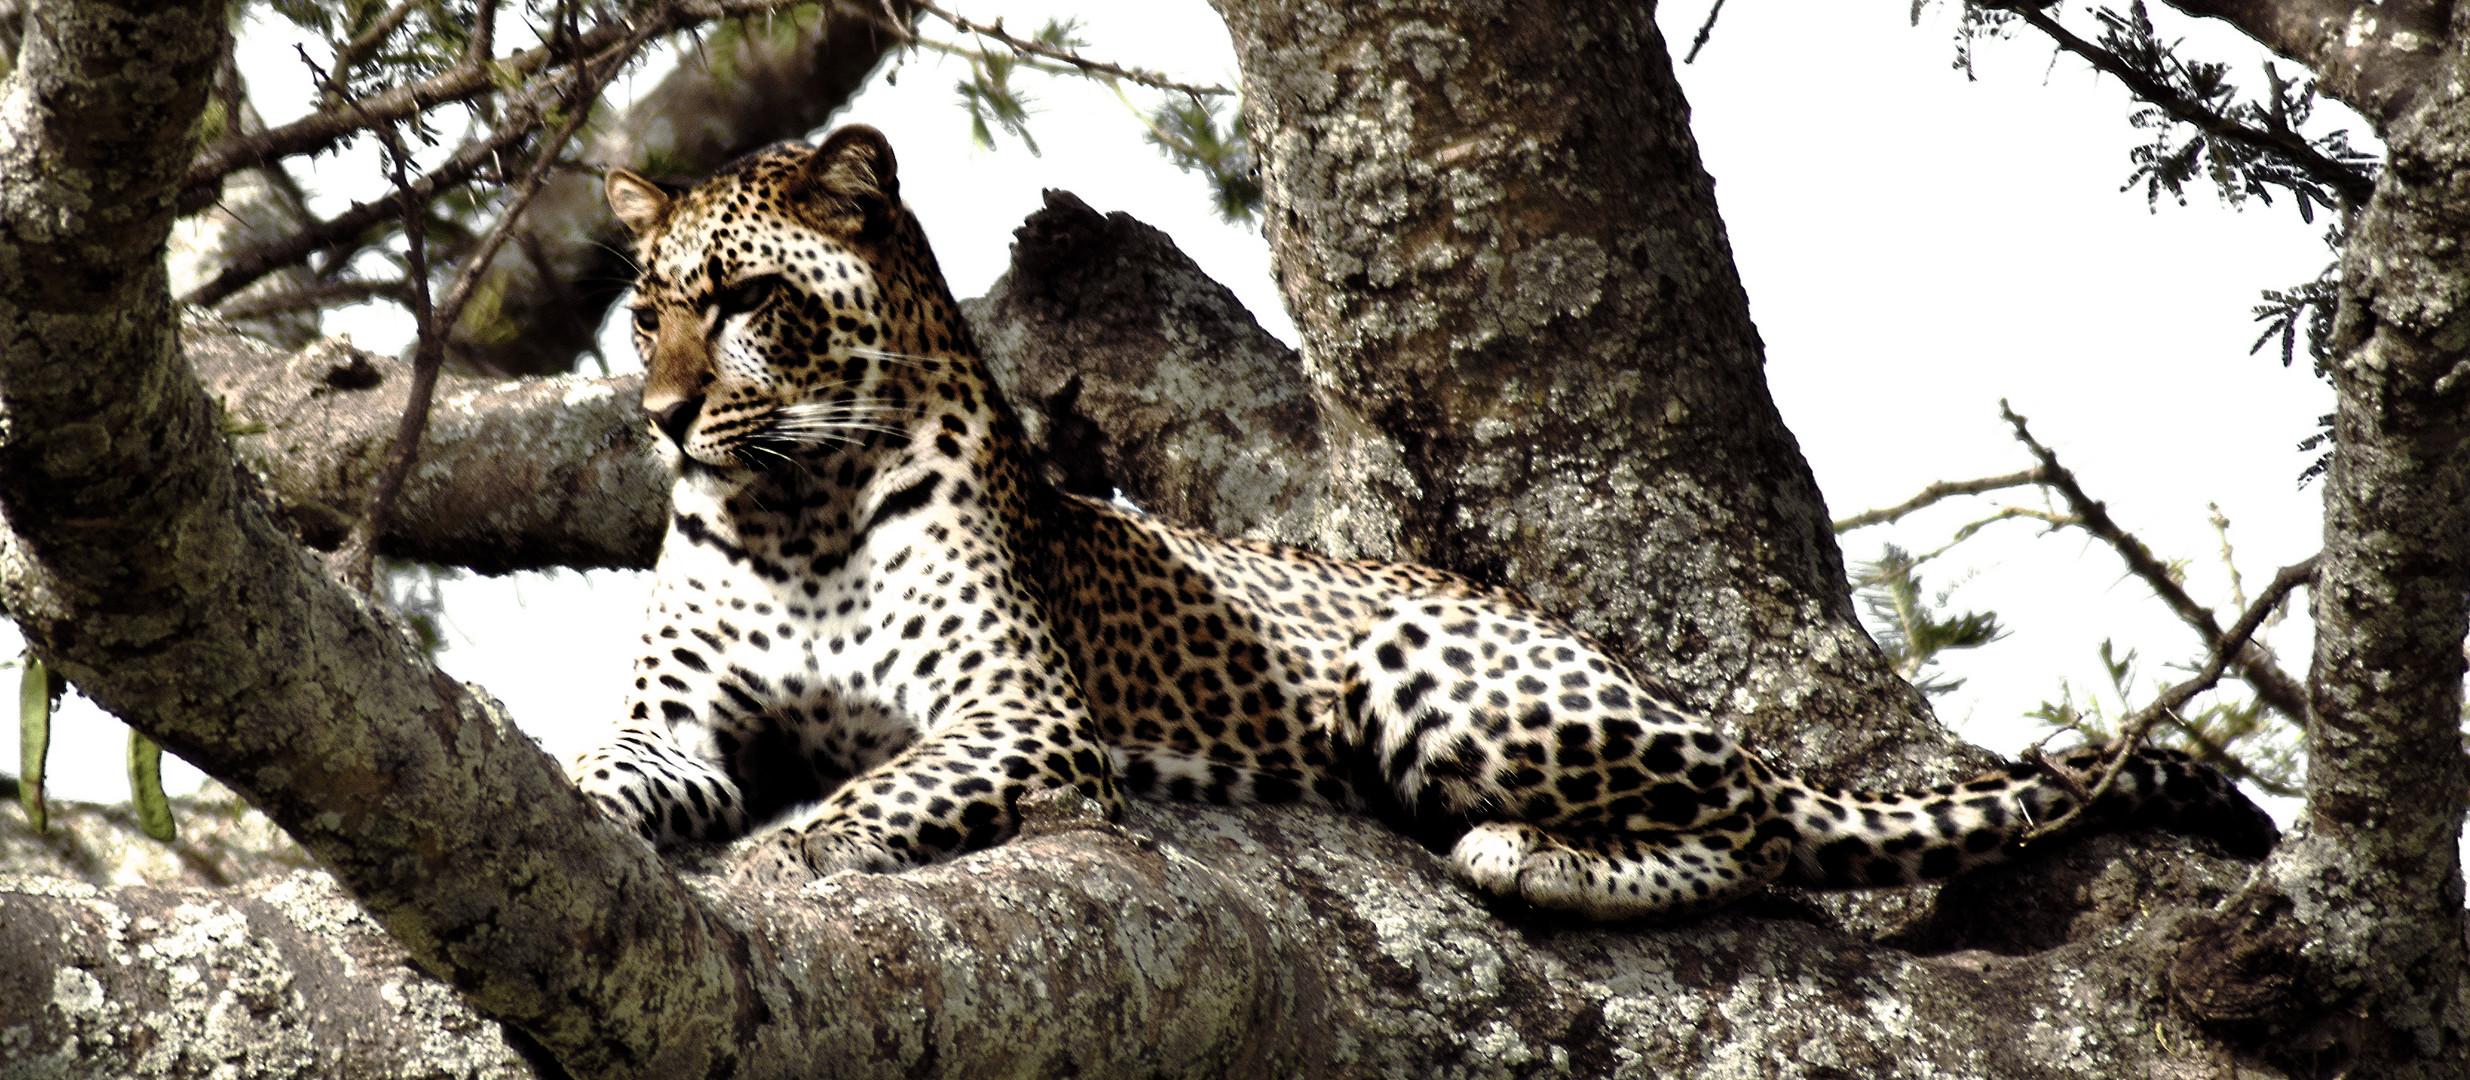 Obstinate Leopard